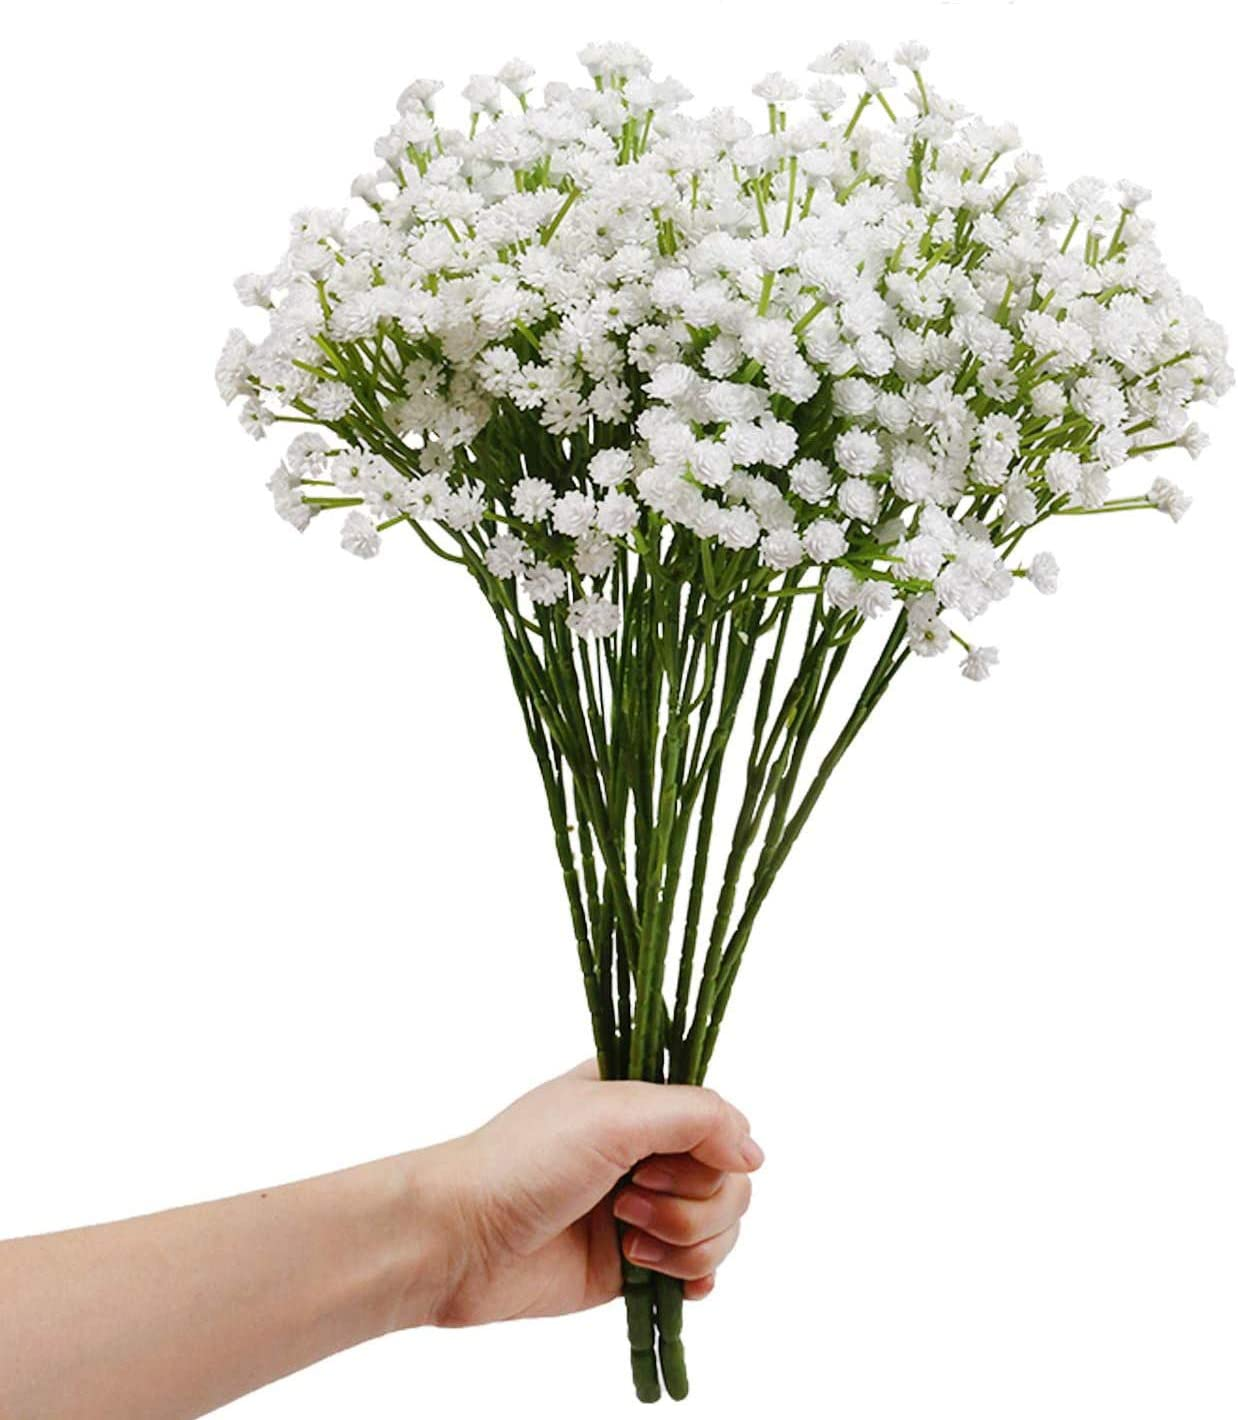 Plastic Fake Artificial Gypsophila Flowers Bouquet Party Home Wedding Decor New